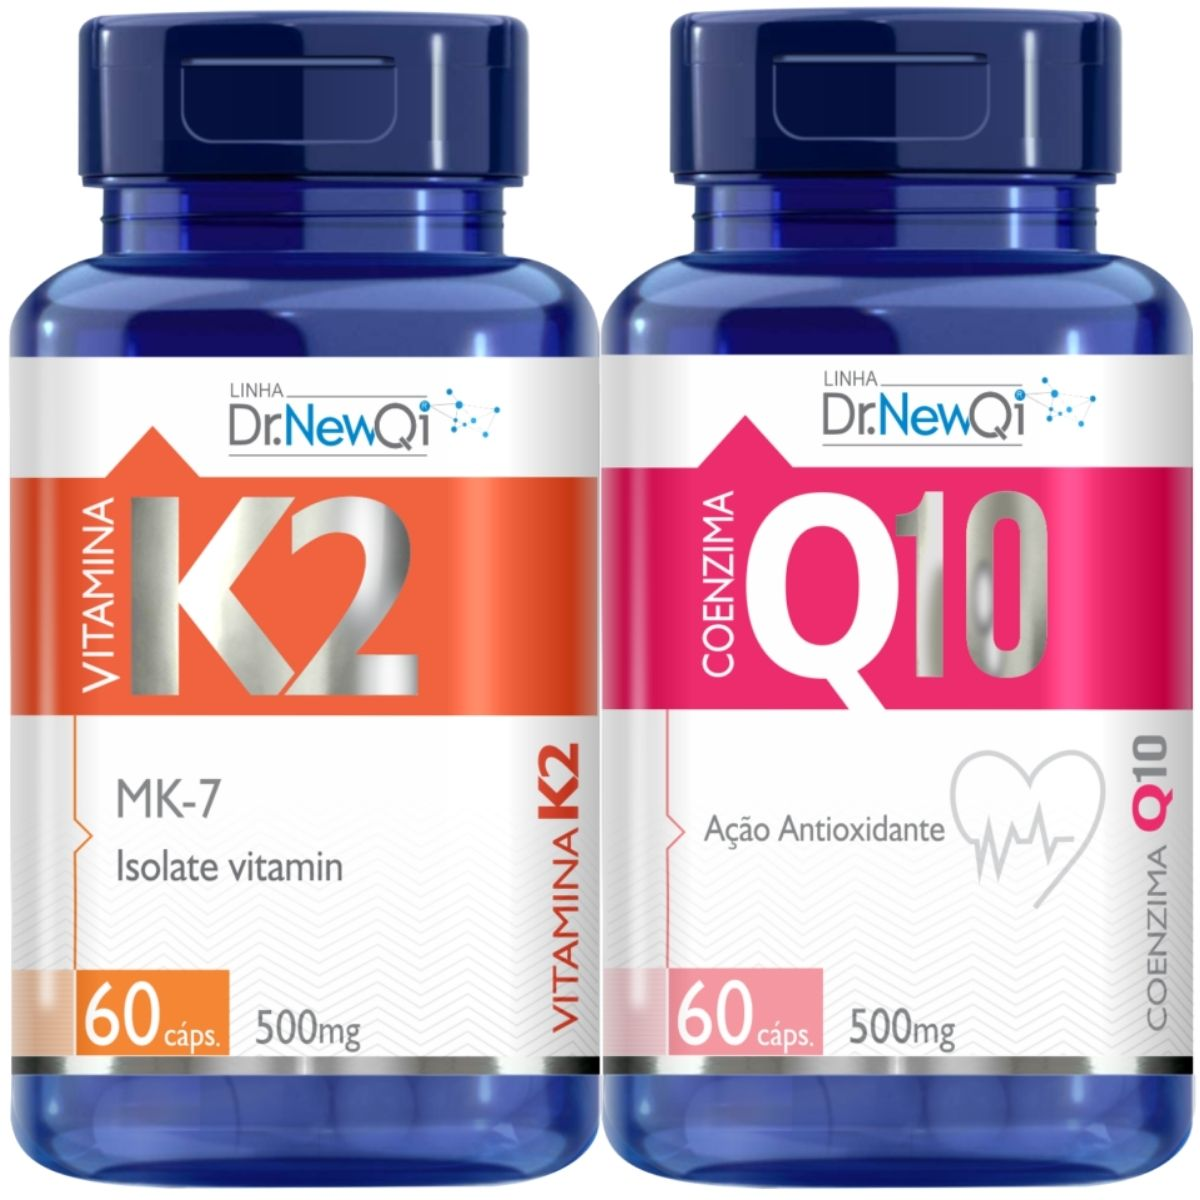 Kit Coenzima Q10 Ubiquinona 60 Cáps + Vitamina K2 Menaquinona 60 Caps - Dr Lair